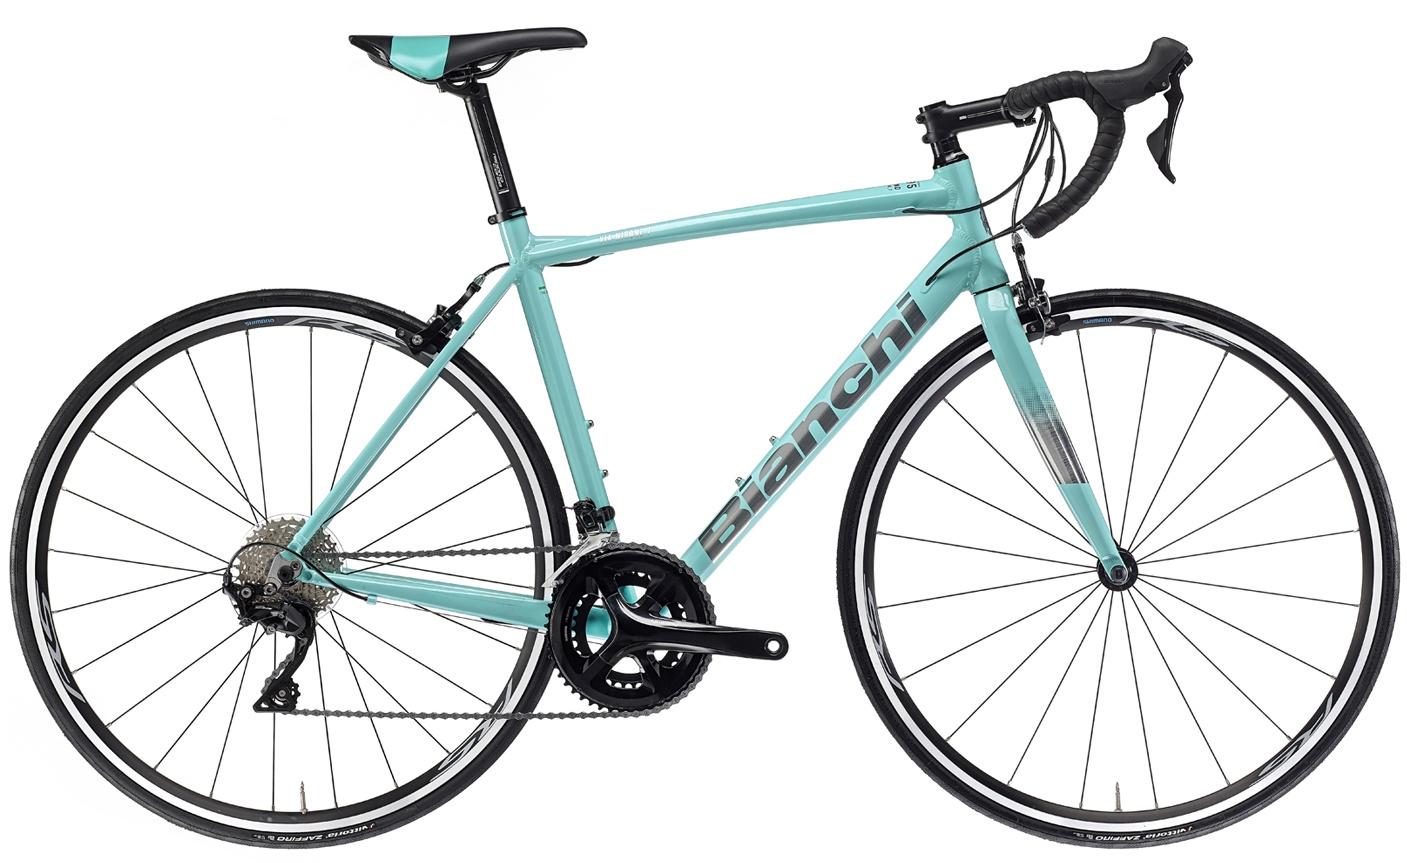 Køb Bianchi Via Nirone 7 Alu 105 22g 2022